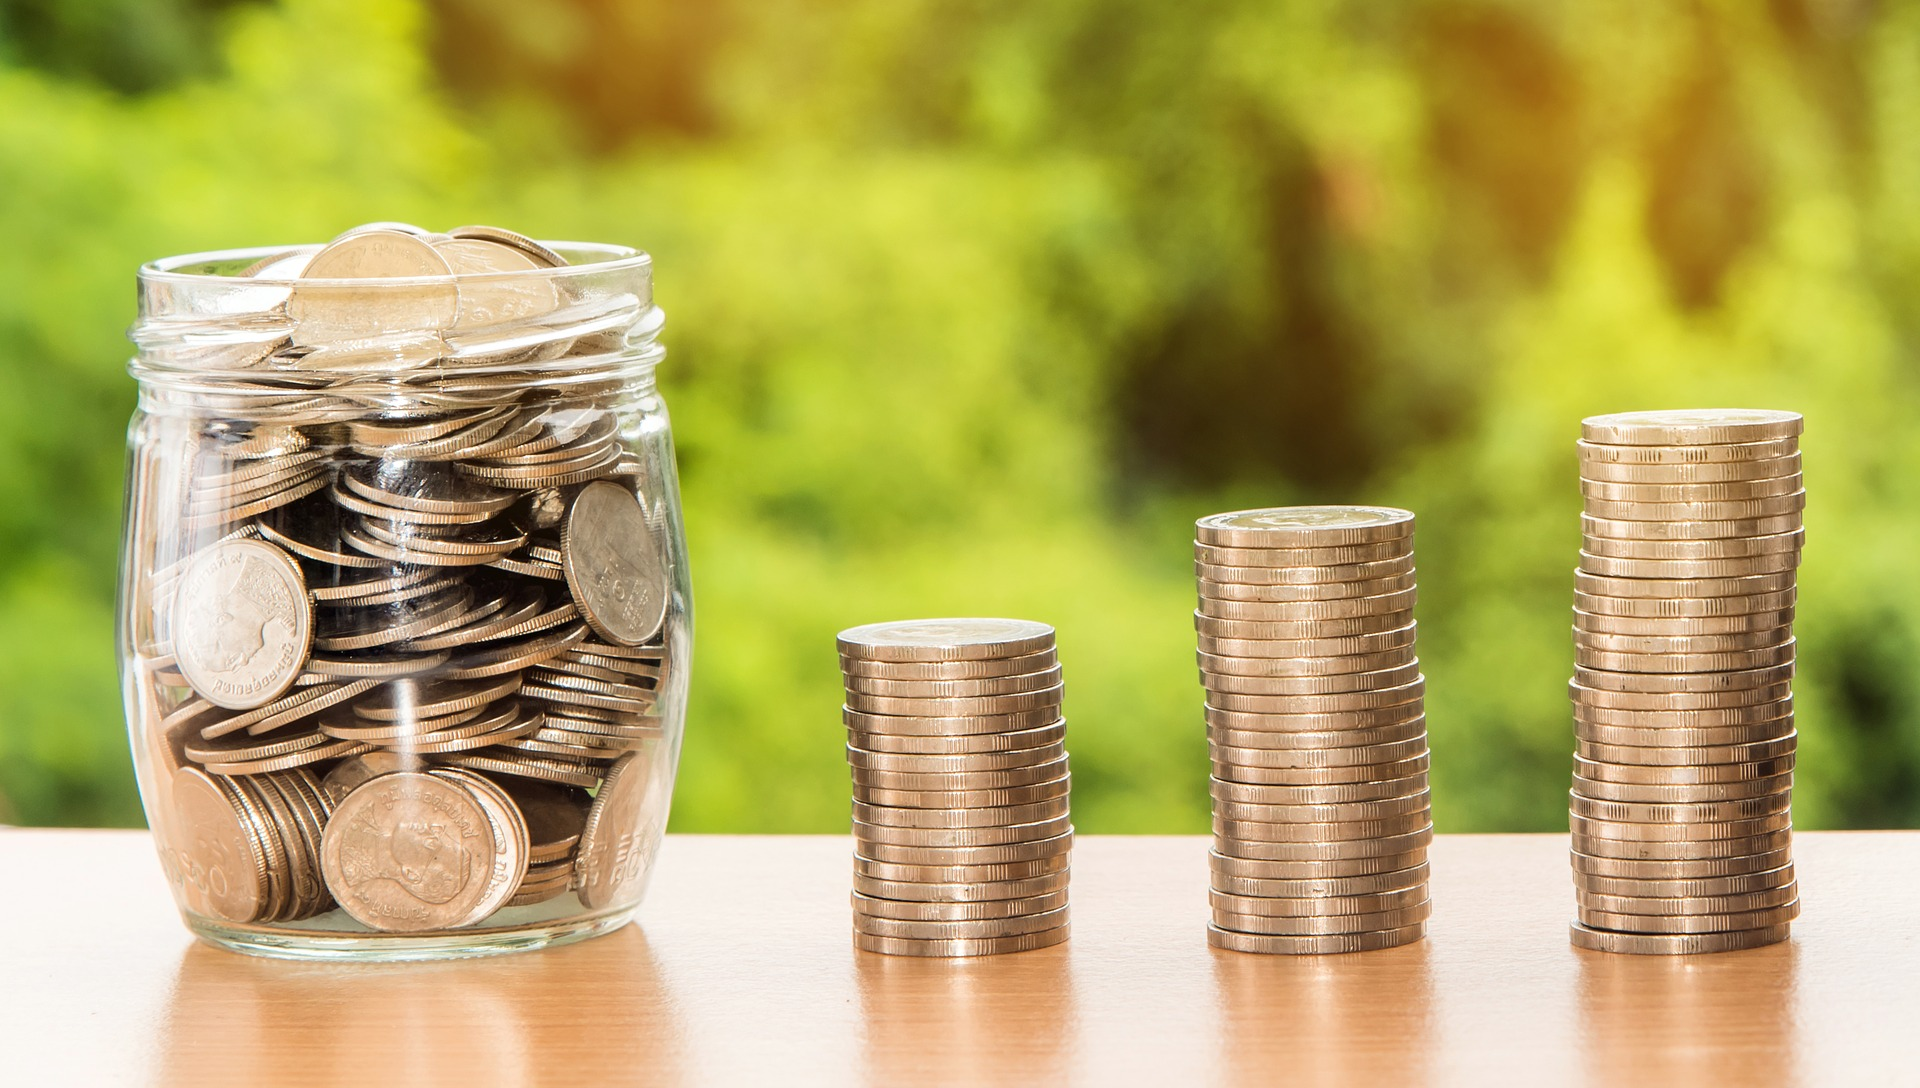 Jak vybrat peníze na svatbě